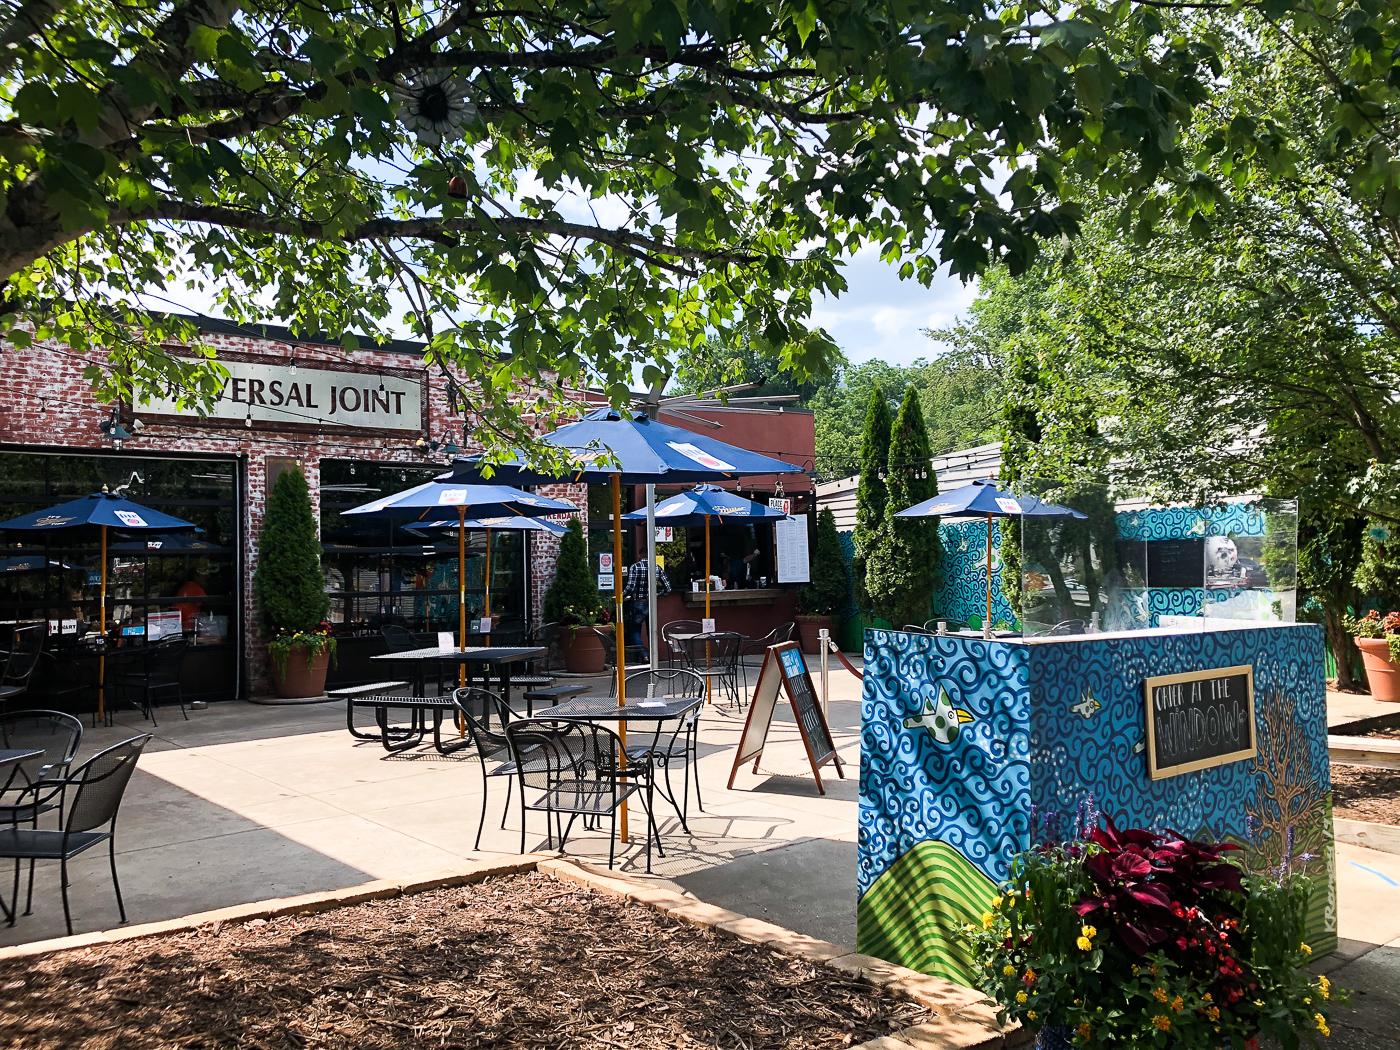 Universal Joint Clayton GA Best Burger in Town